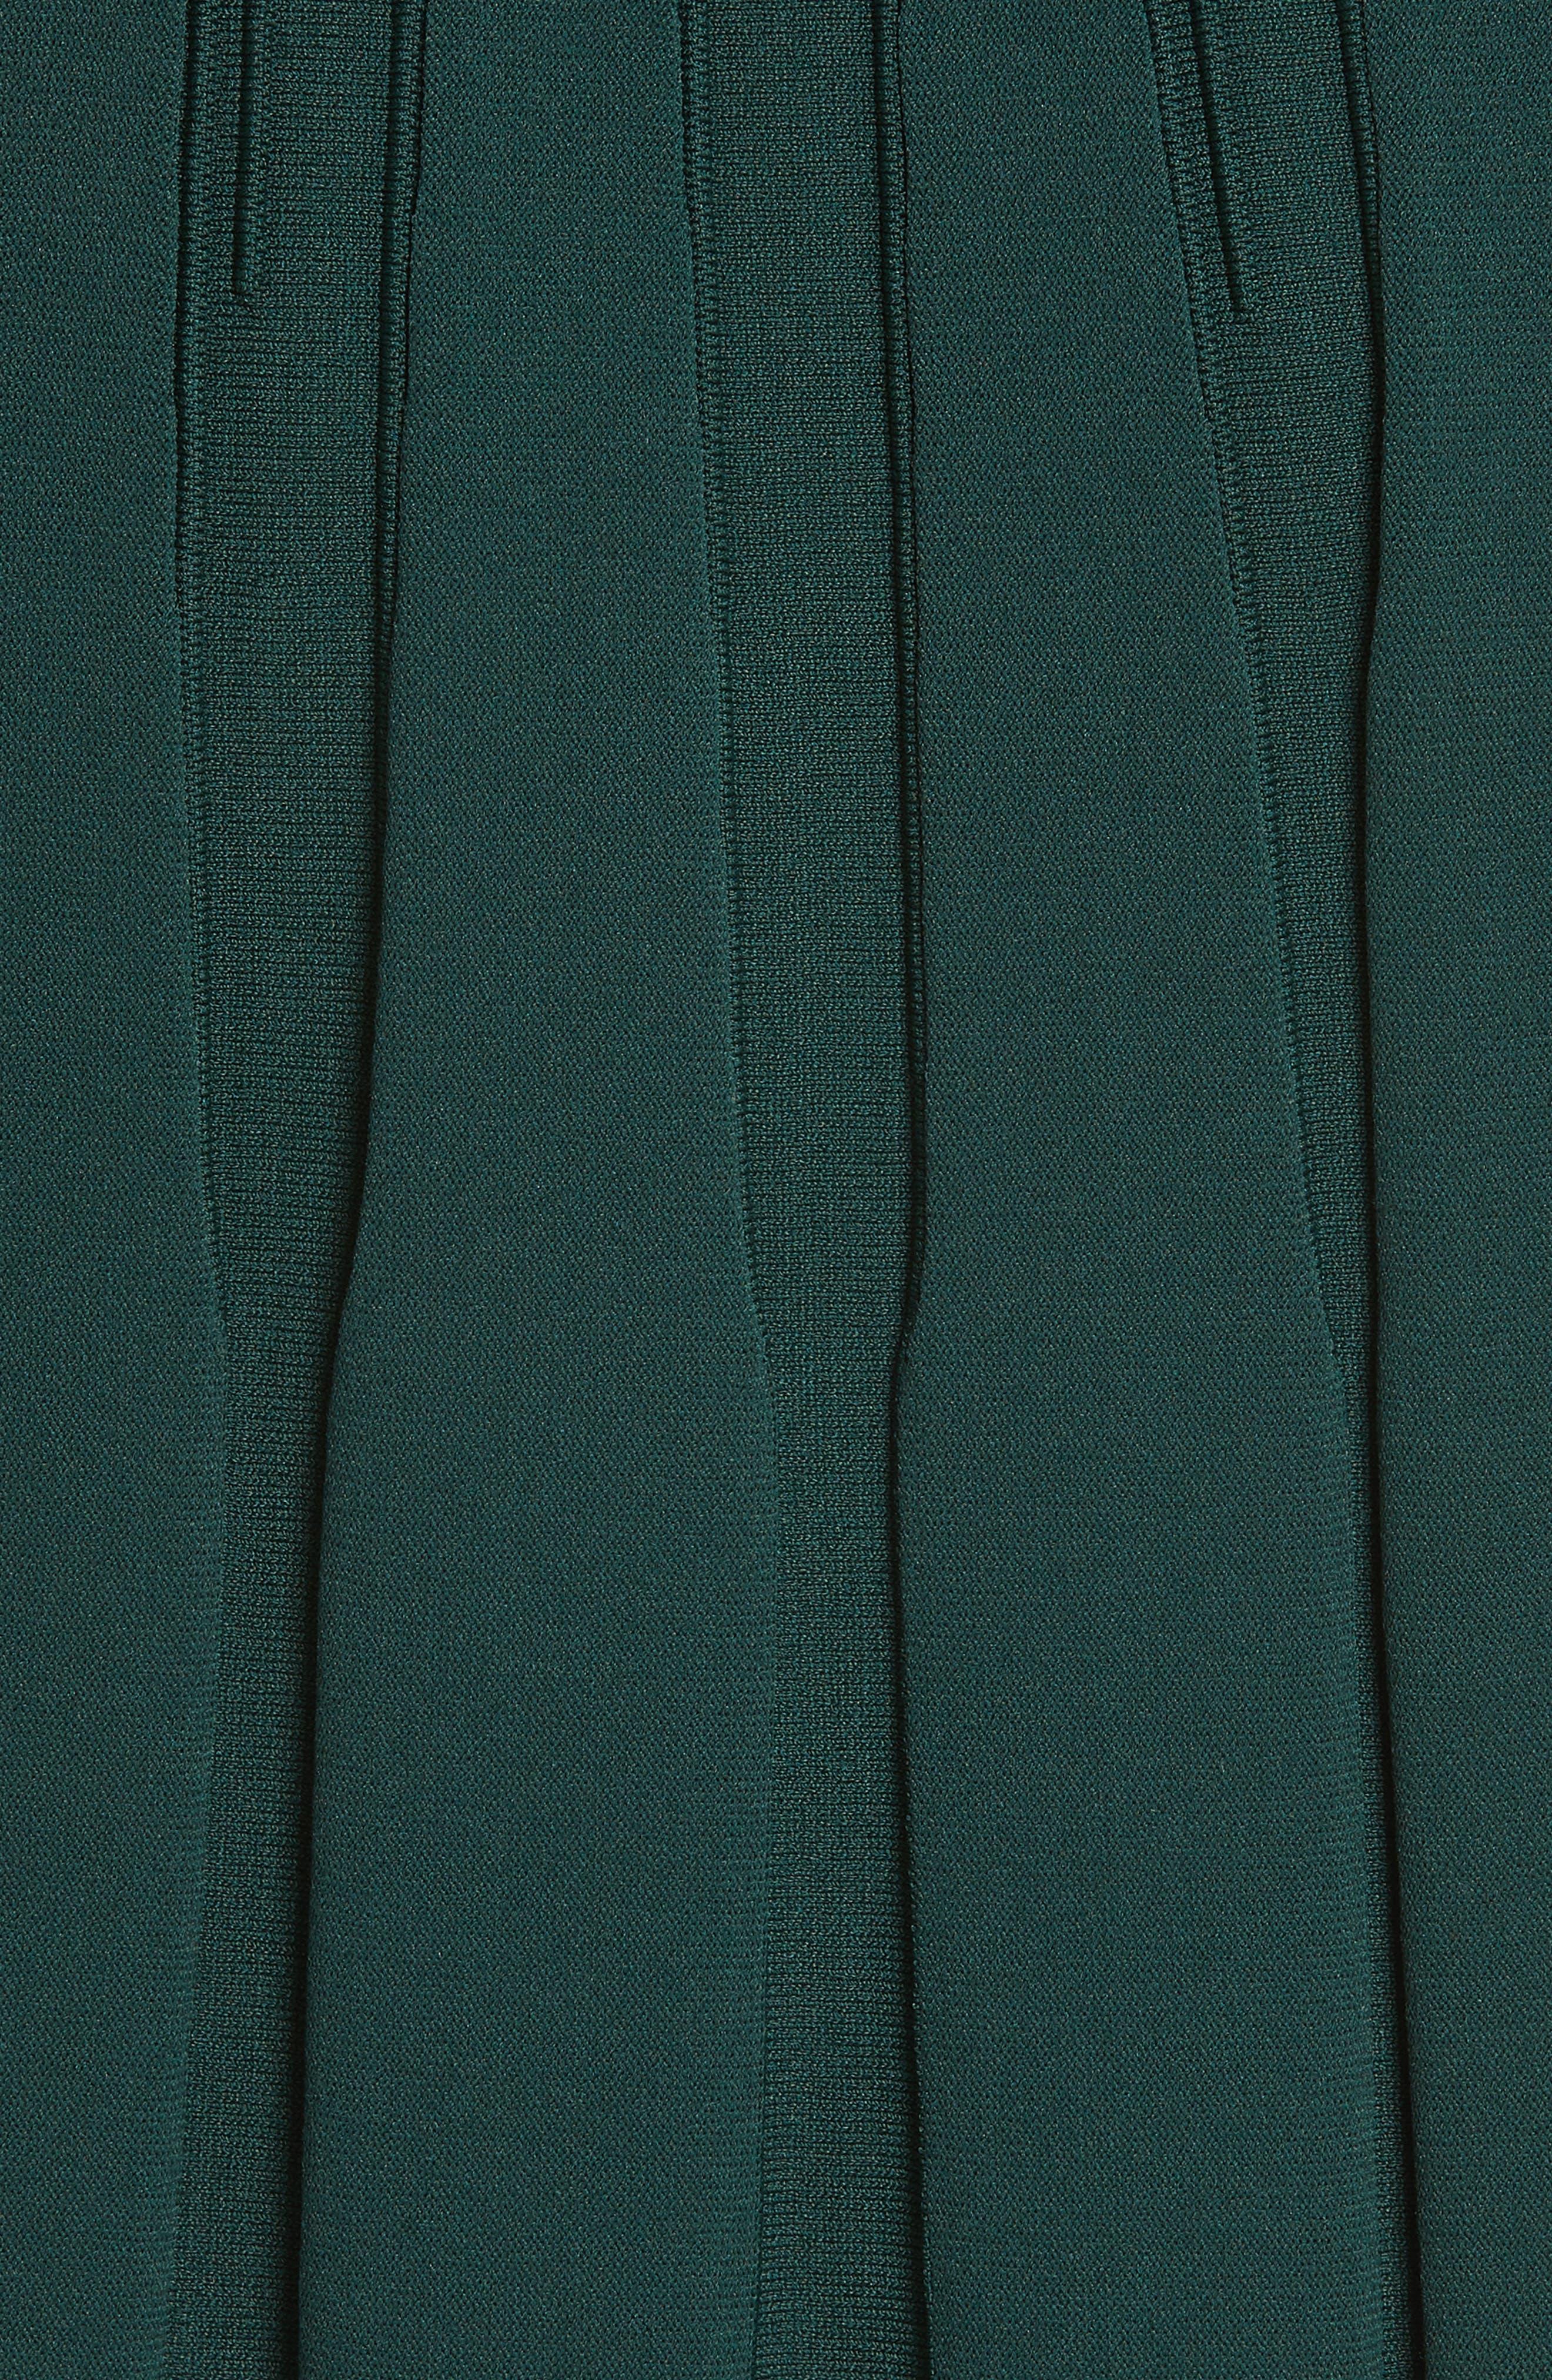 Dorlean Knit Dress,                             Alternate thumbnail 5, color,                             DARK GREEN